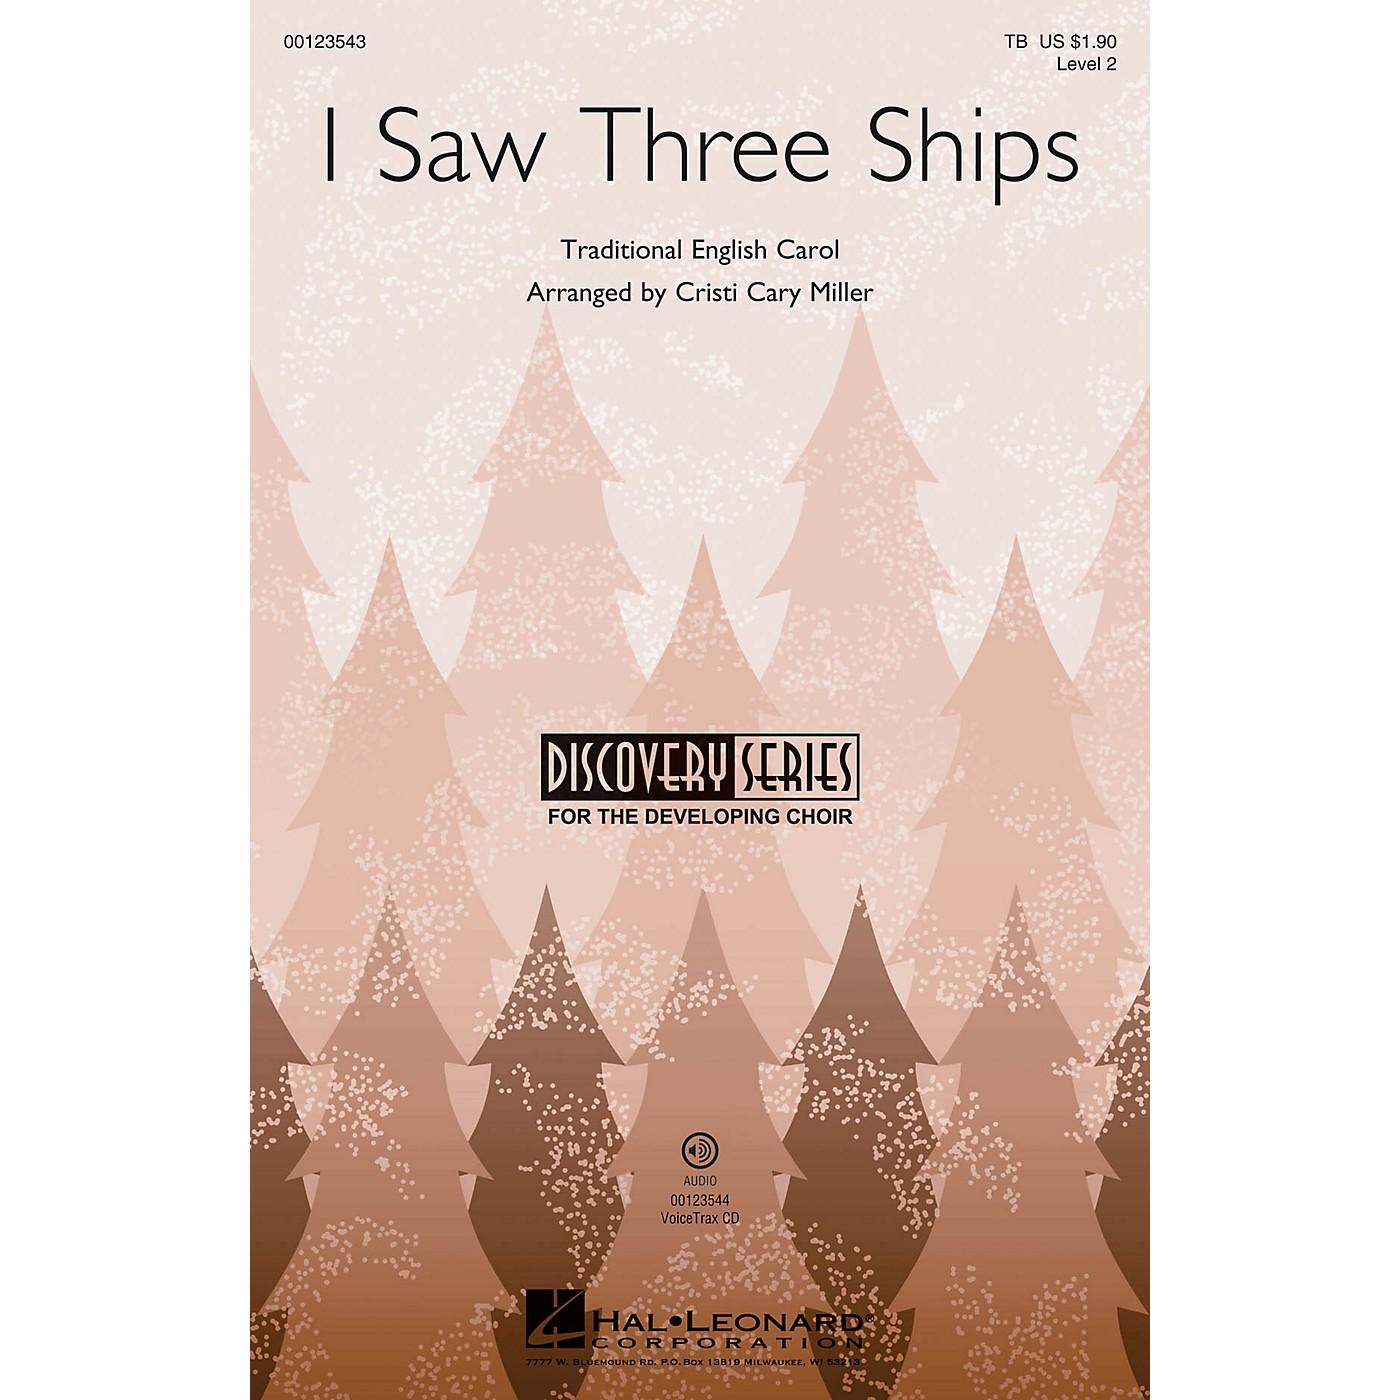 Hal Leonard I Saw Three Ships (Discovery Level 2) TB arranged by Cristi Cary Miller thumbnail